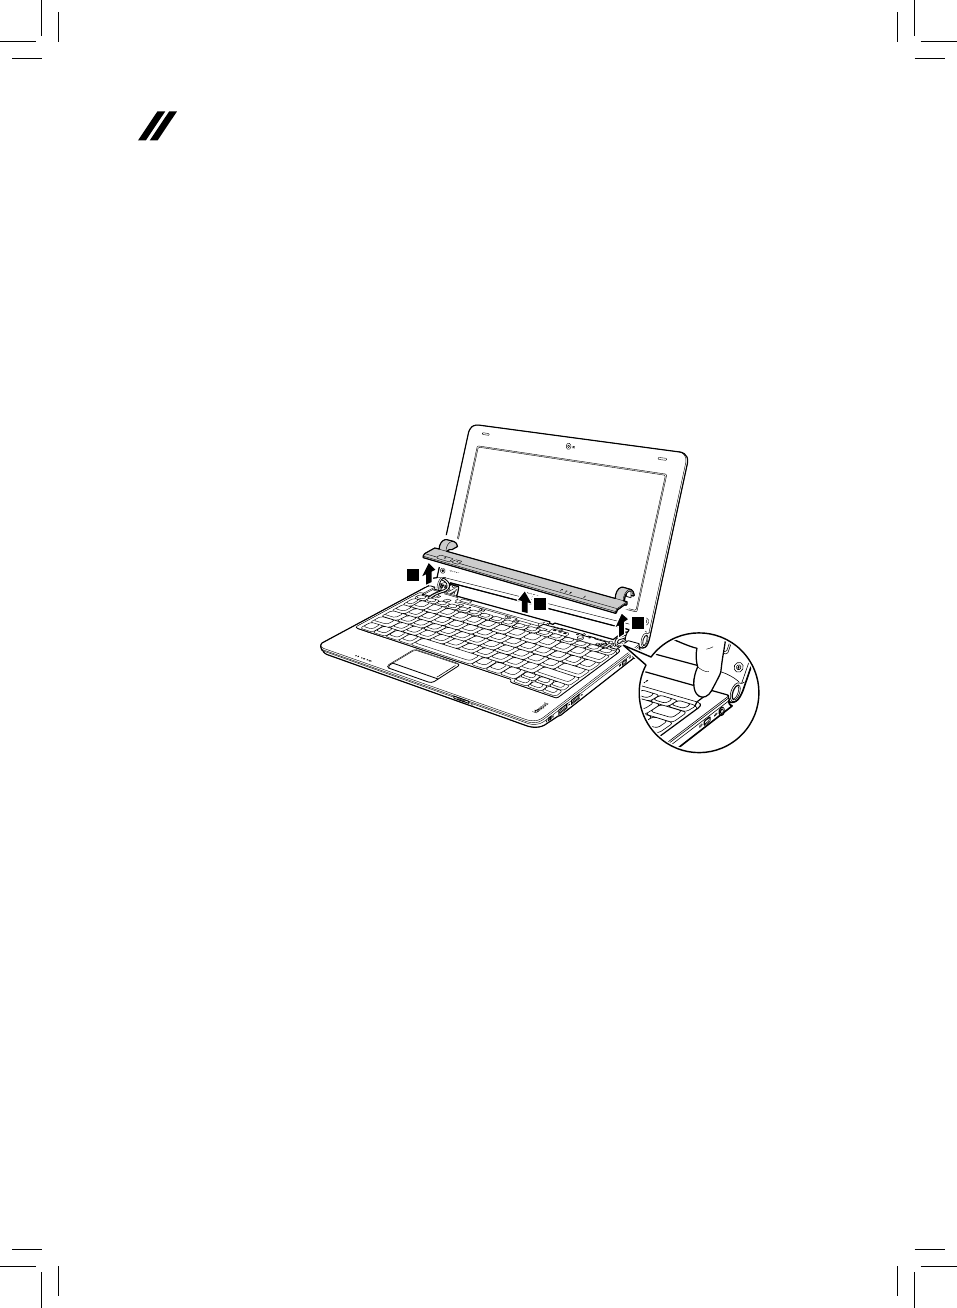 Laptop Keyboard for Lenovo S10-2 S10-2C S10-3C Nordic NE 25009505 New